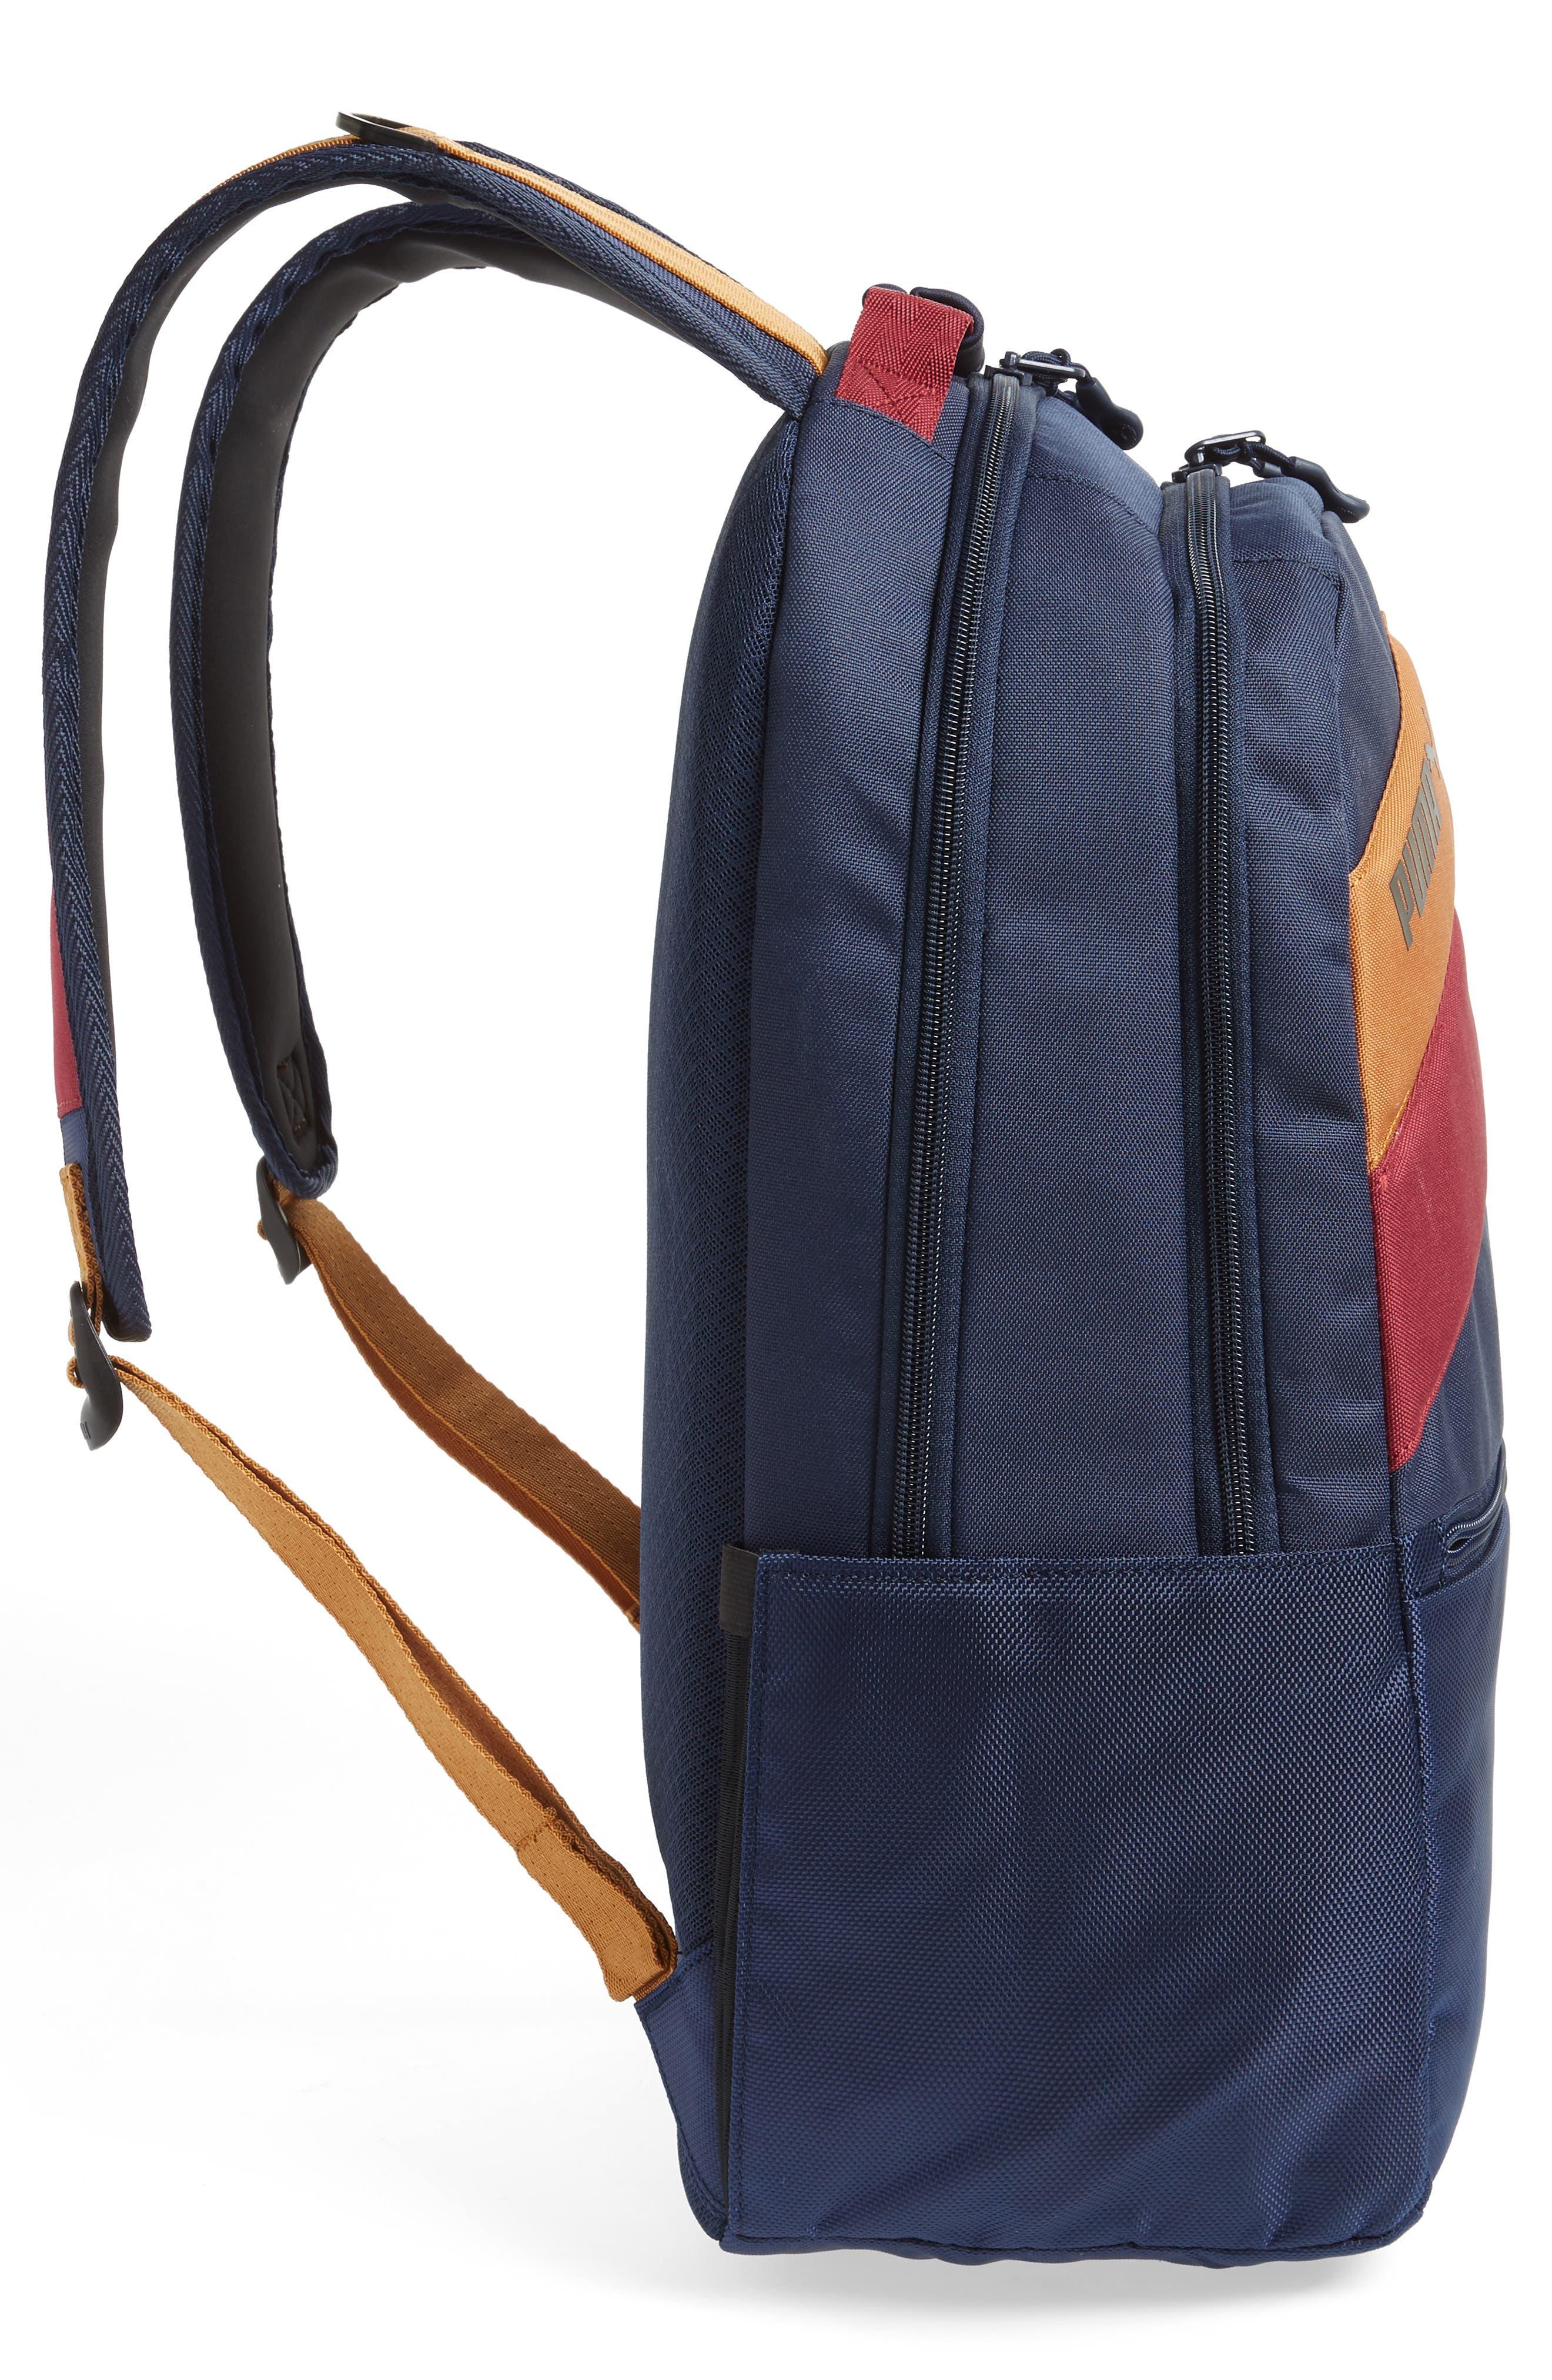 PUMA,                             Ready Backpack,                             Alternate thumbnail 5, color,                             NAVY